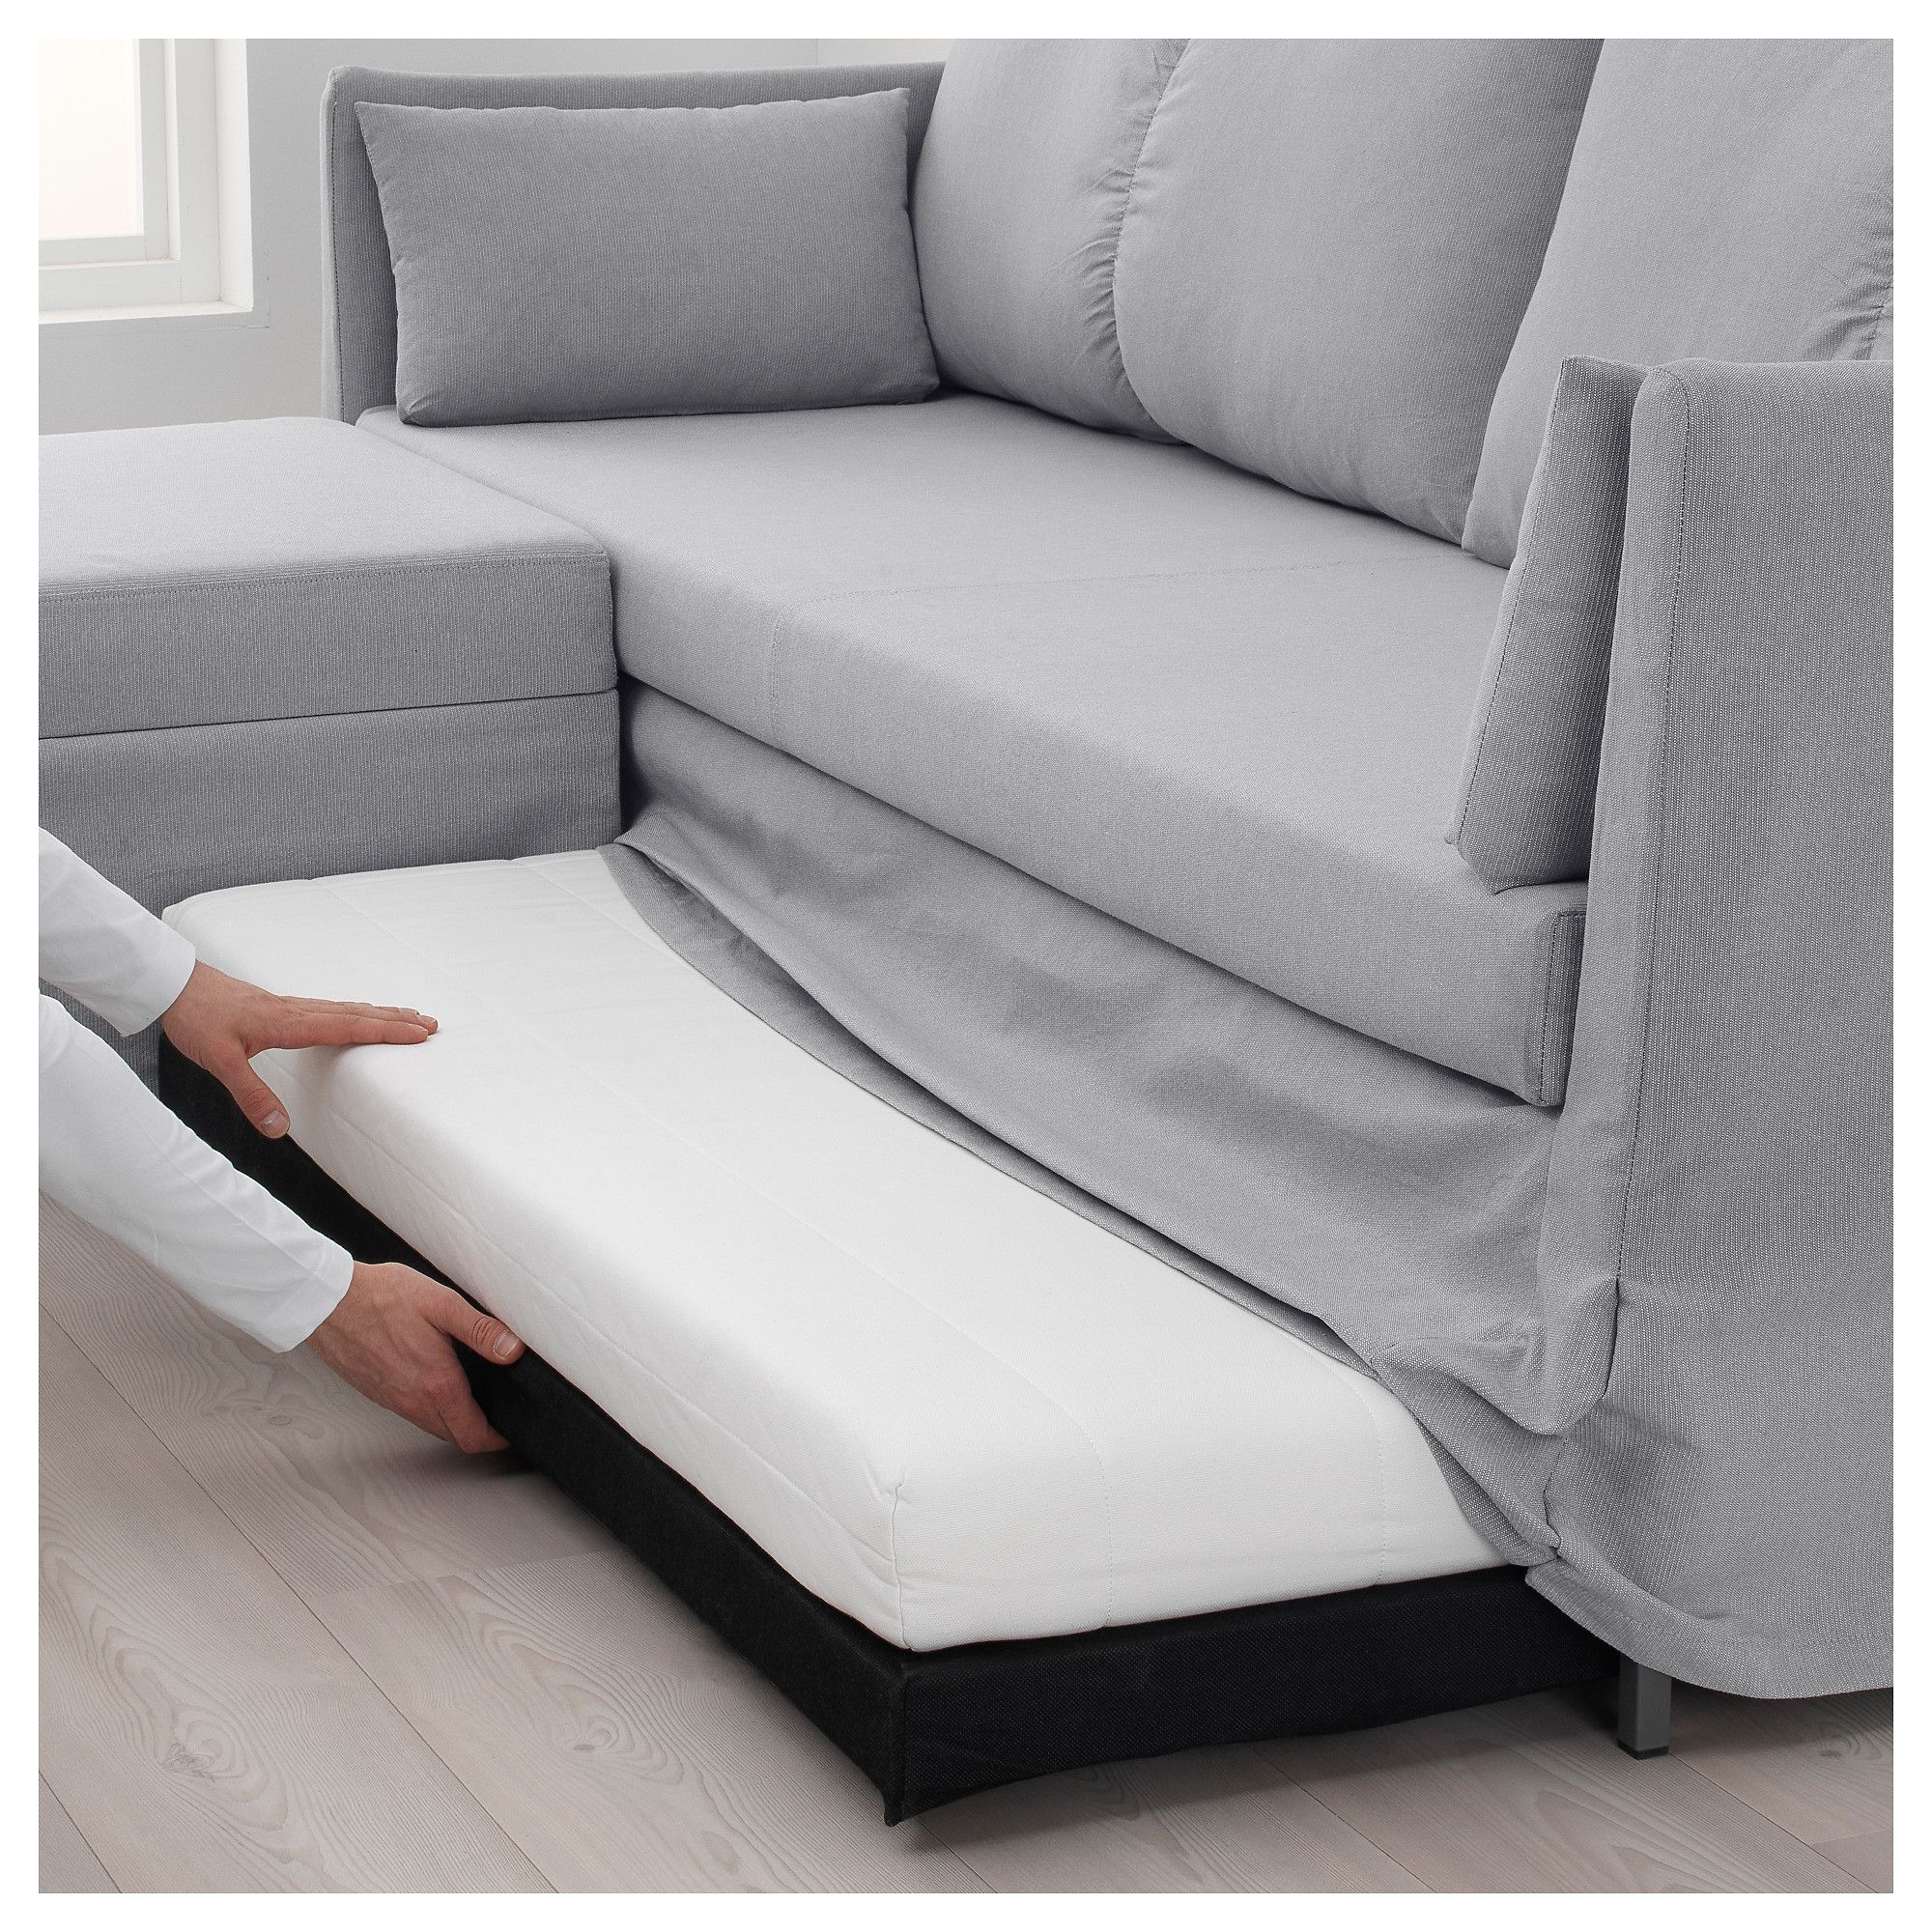 furnititure reviews futons madison kyoto wayfair modern futon wi store uk atlanta bm co